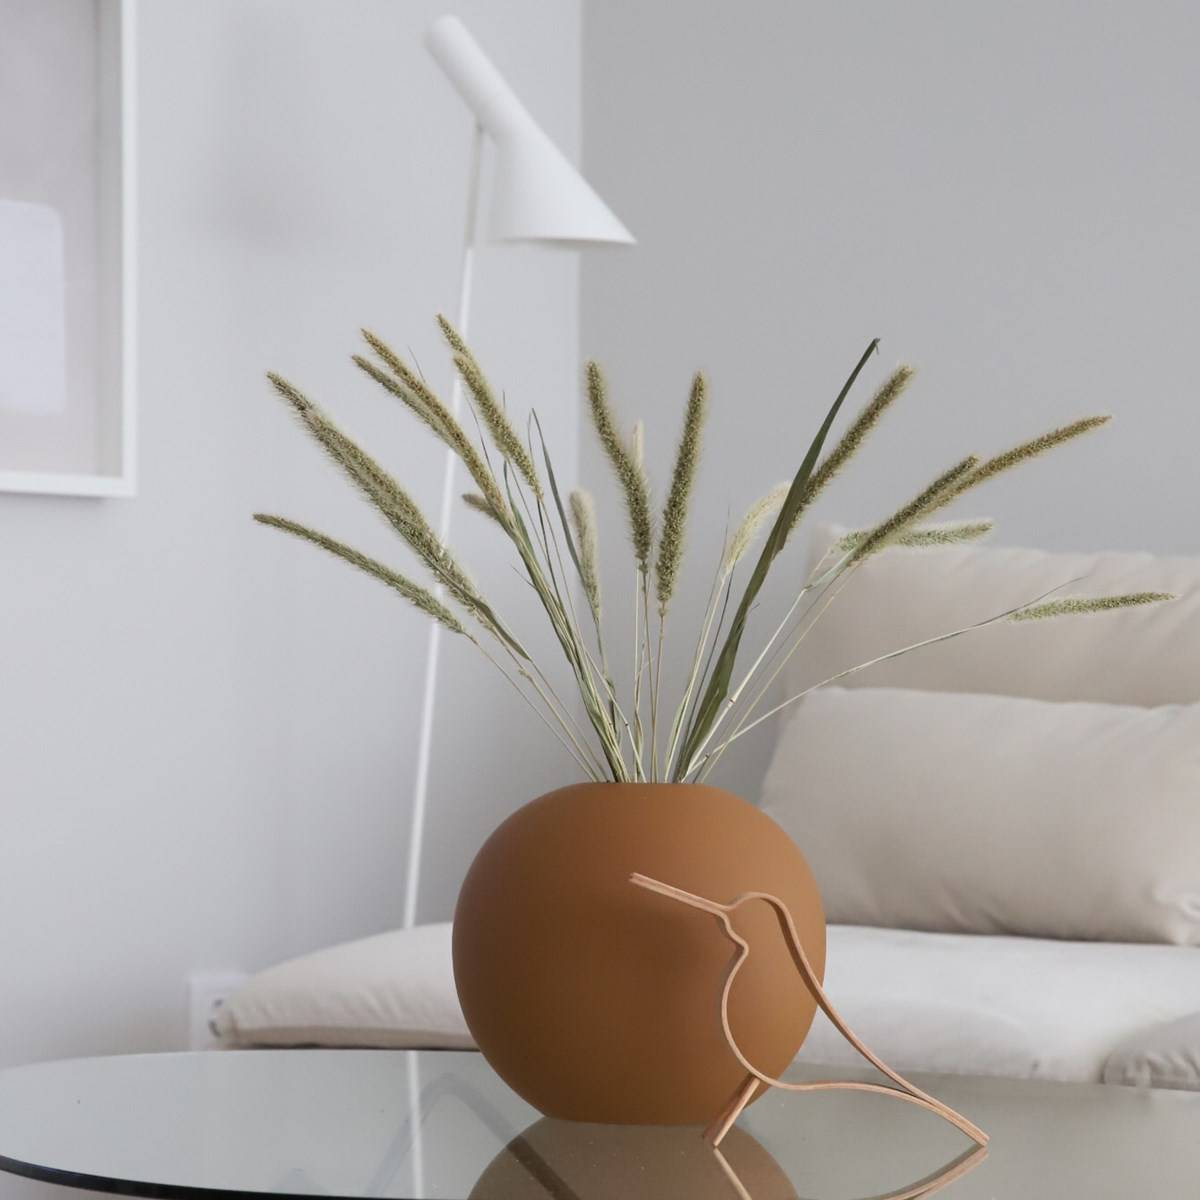 Ball Vase - Coconut